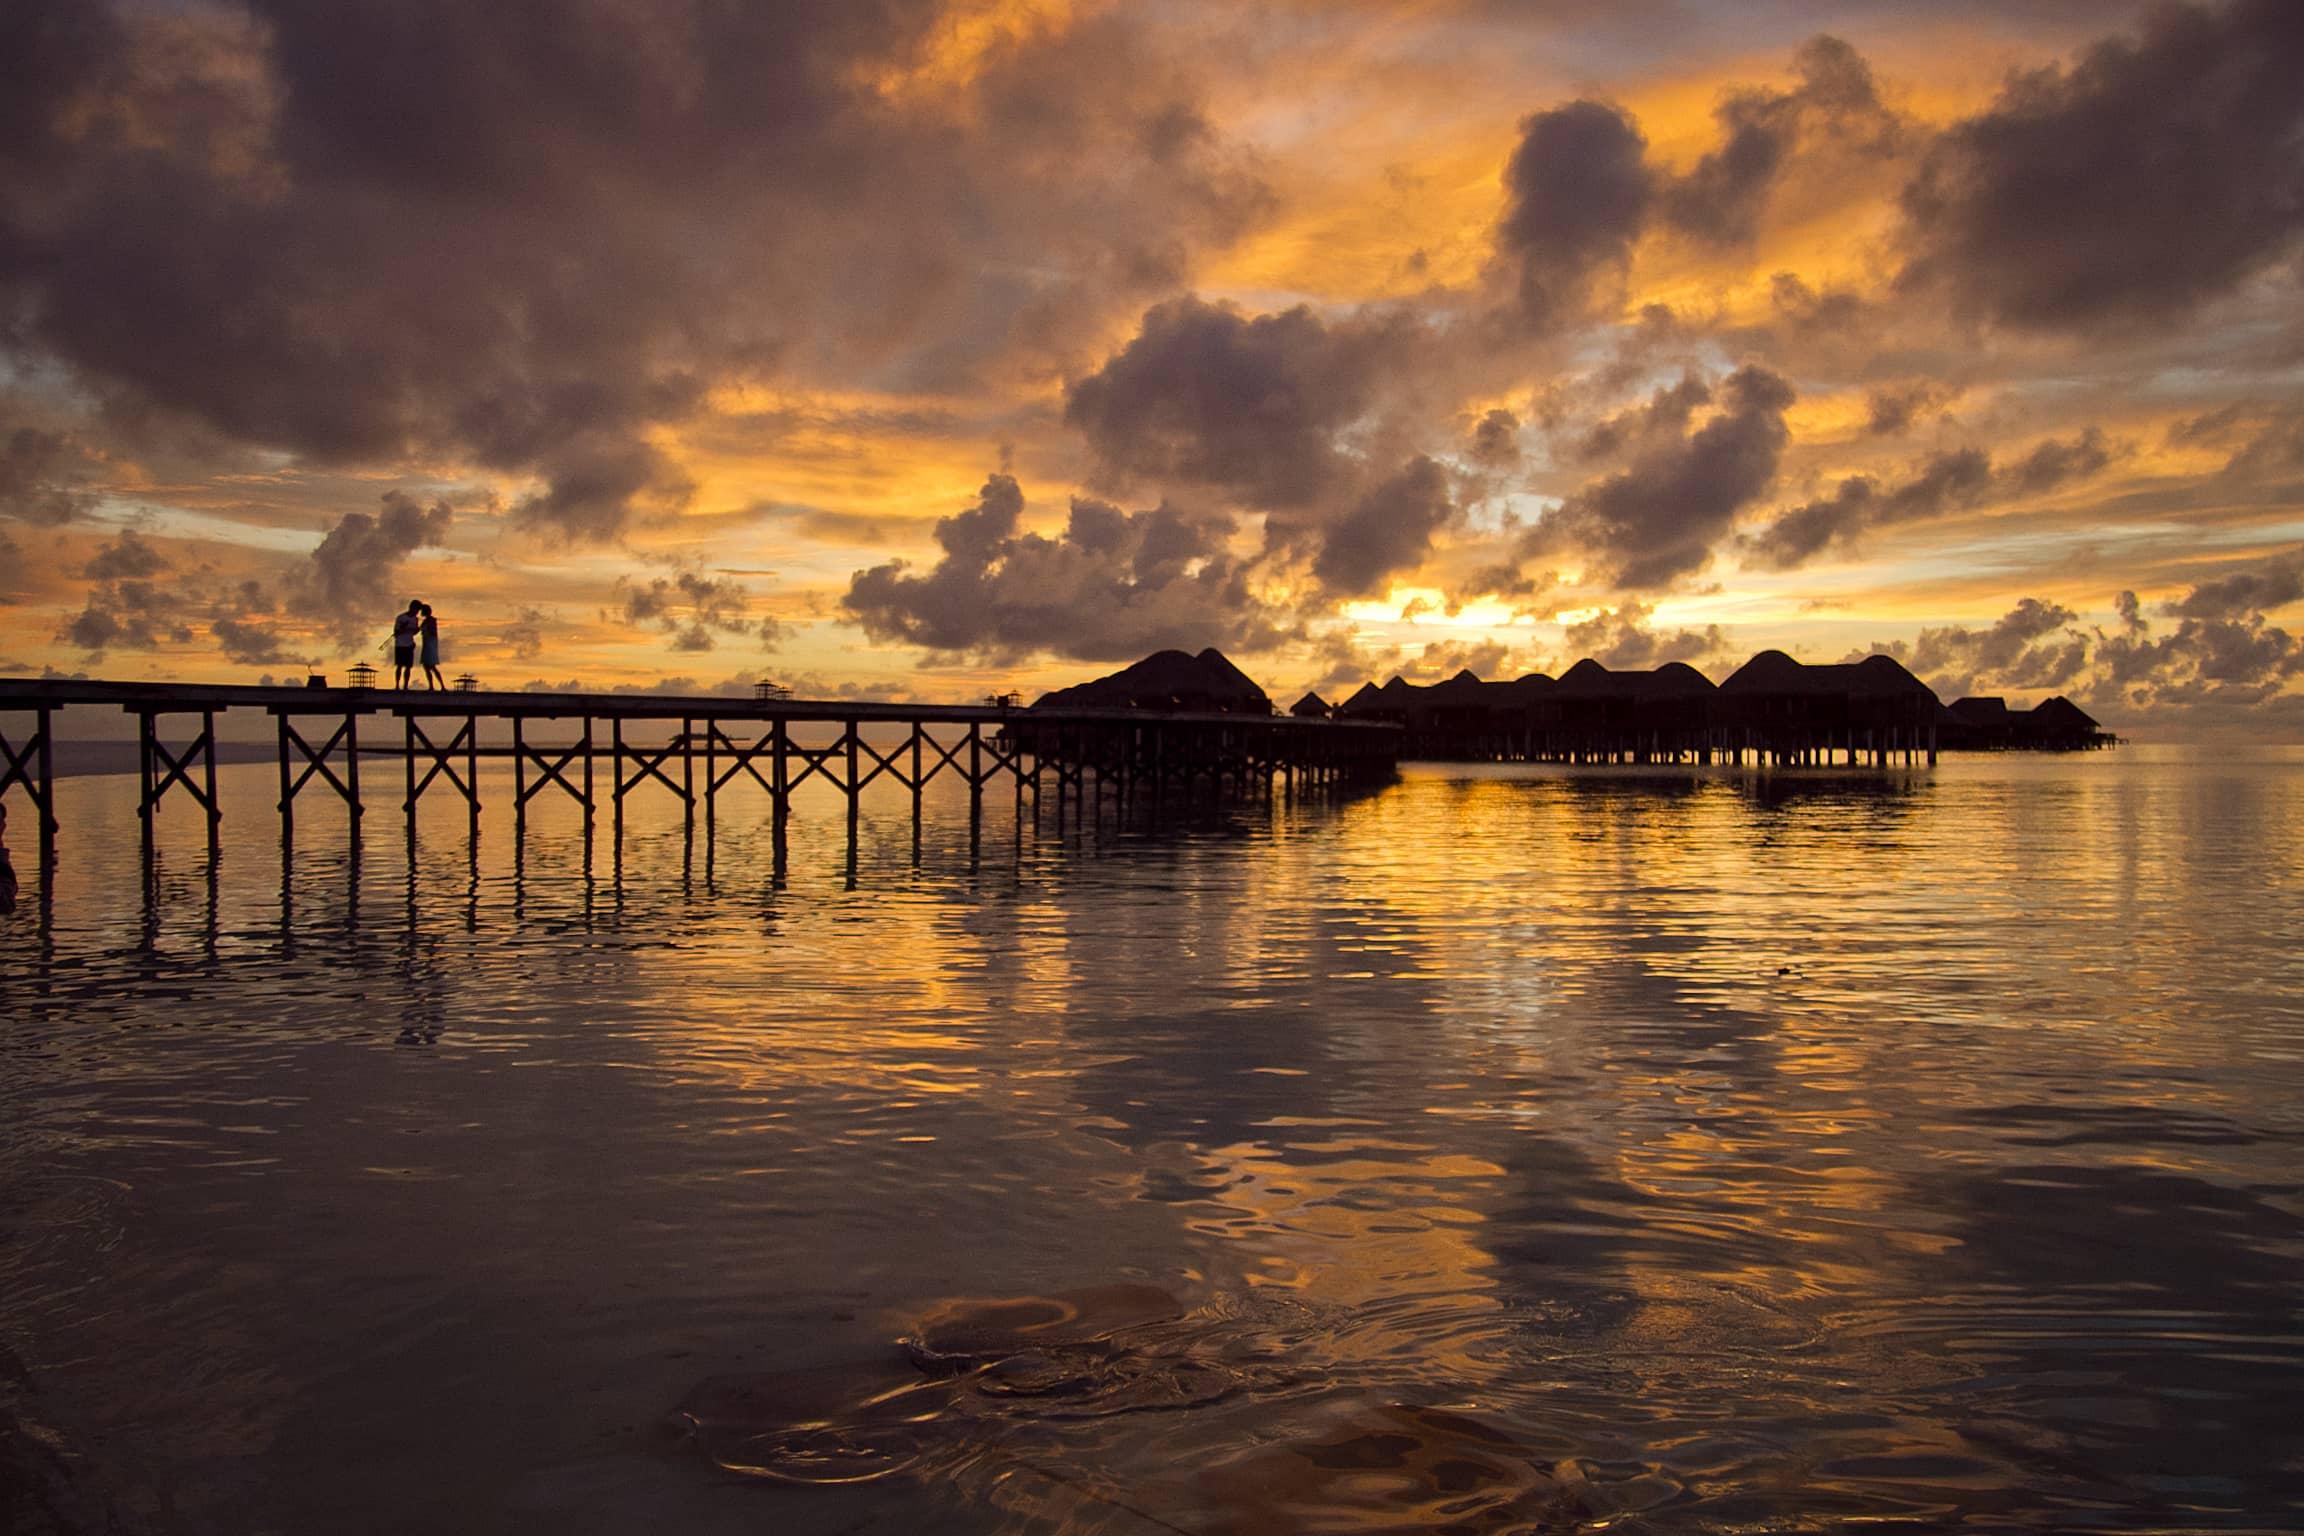 Photo taken by Angel Gomila at Constance Halaveli Resort, Maldives